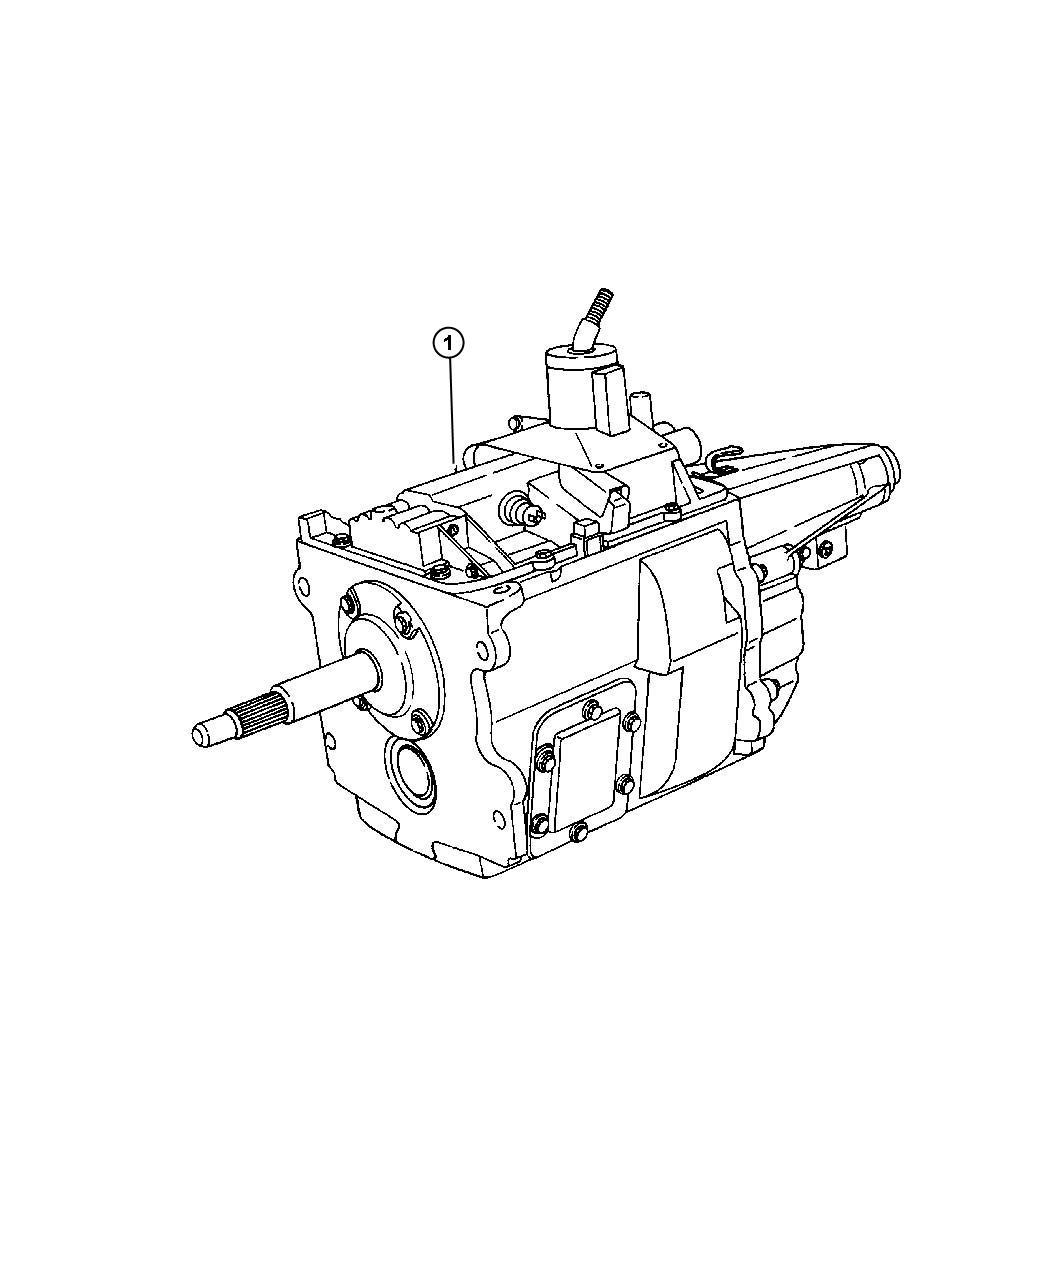 Dodge Ram Trans 5 Speed Transmission Manual